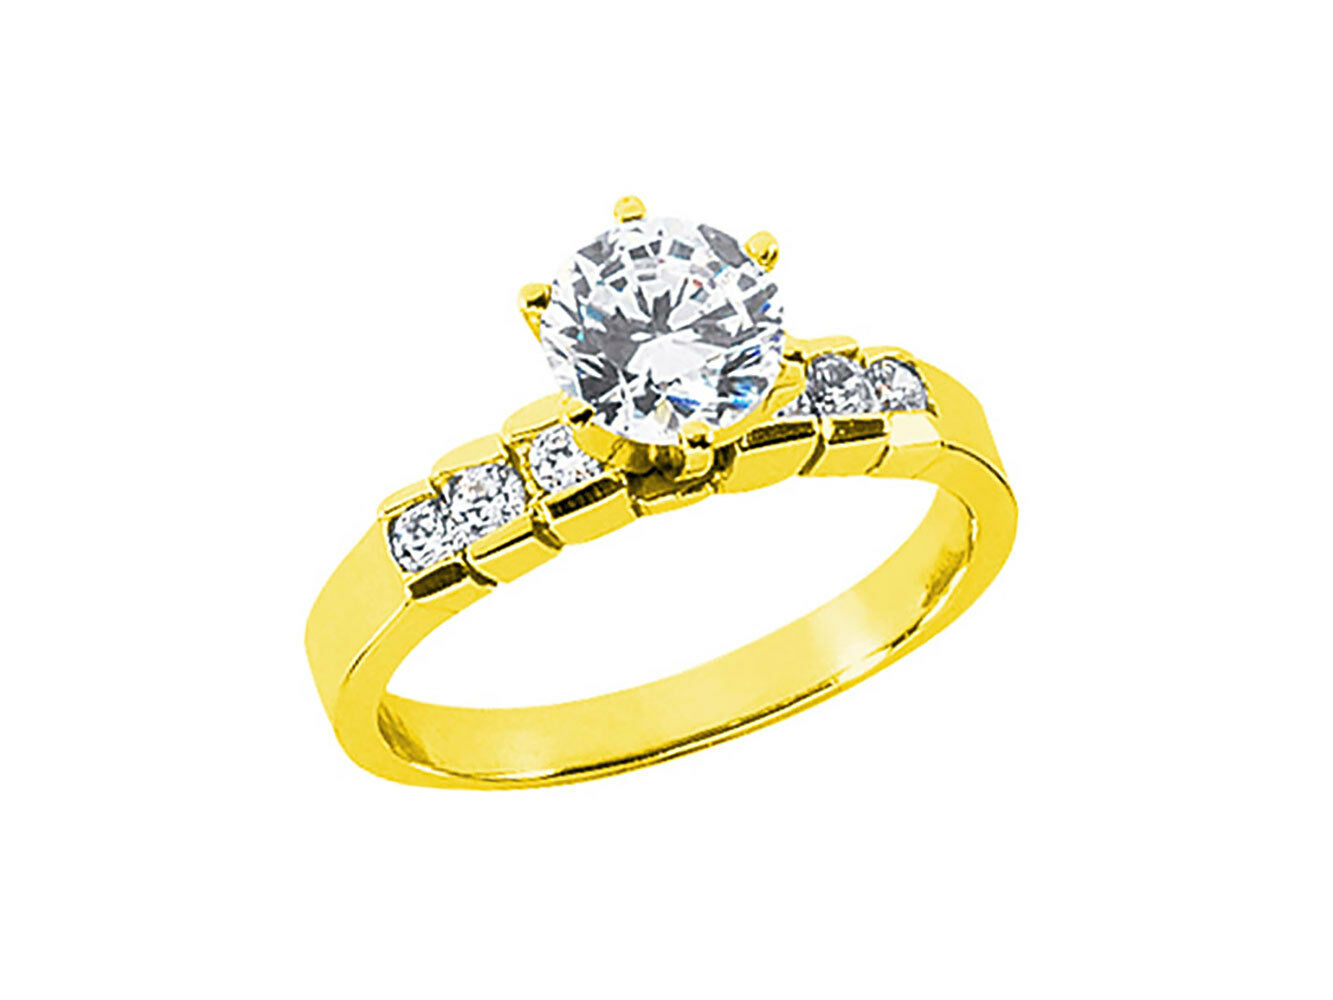 Natural 0.50Carat Round Cut Diamond Bridal Engagement Ring Solid 14k gold